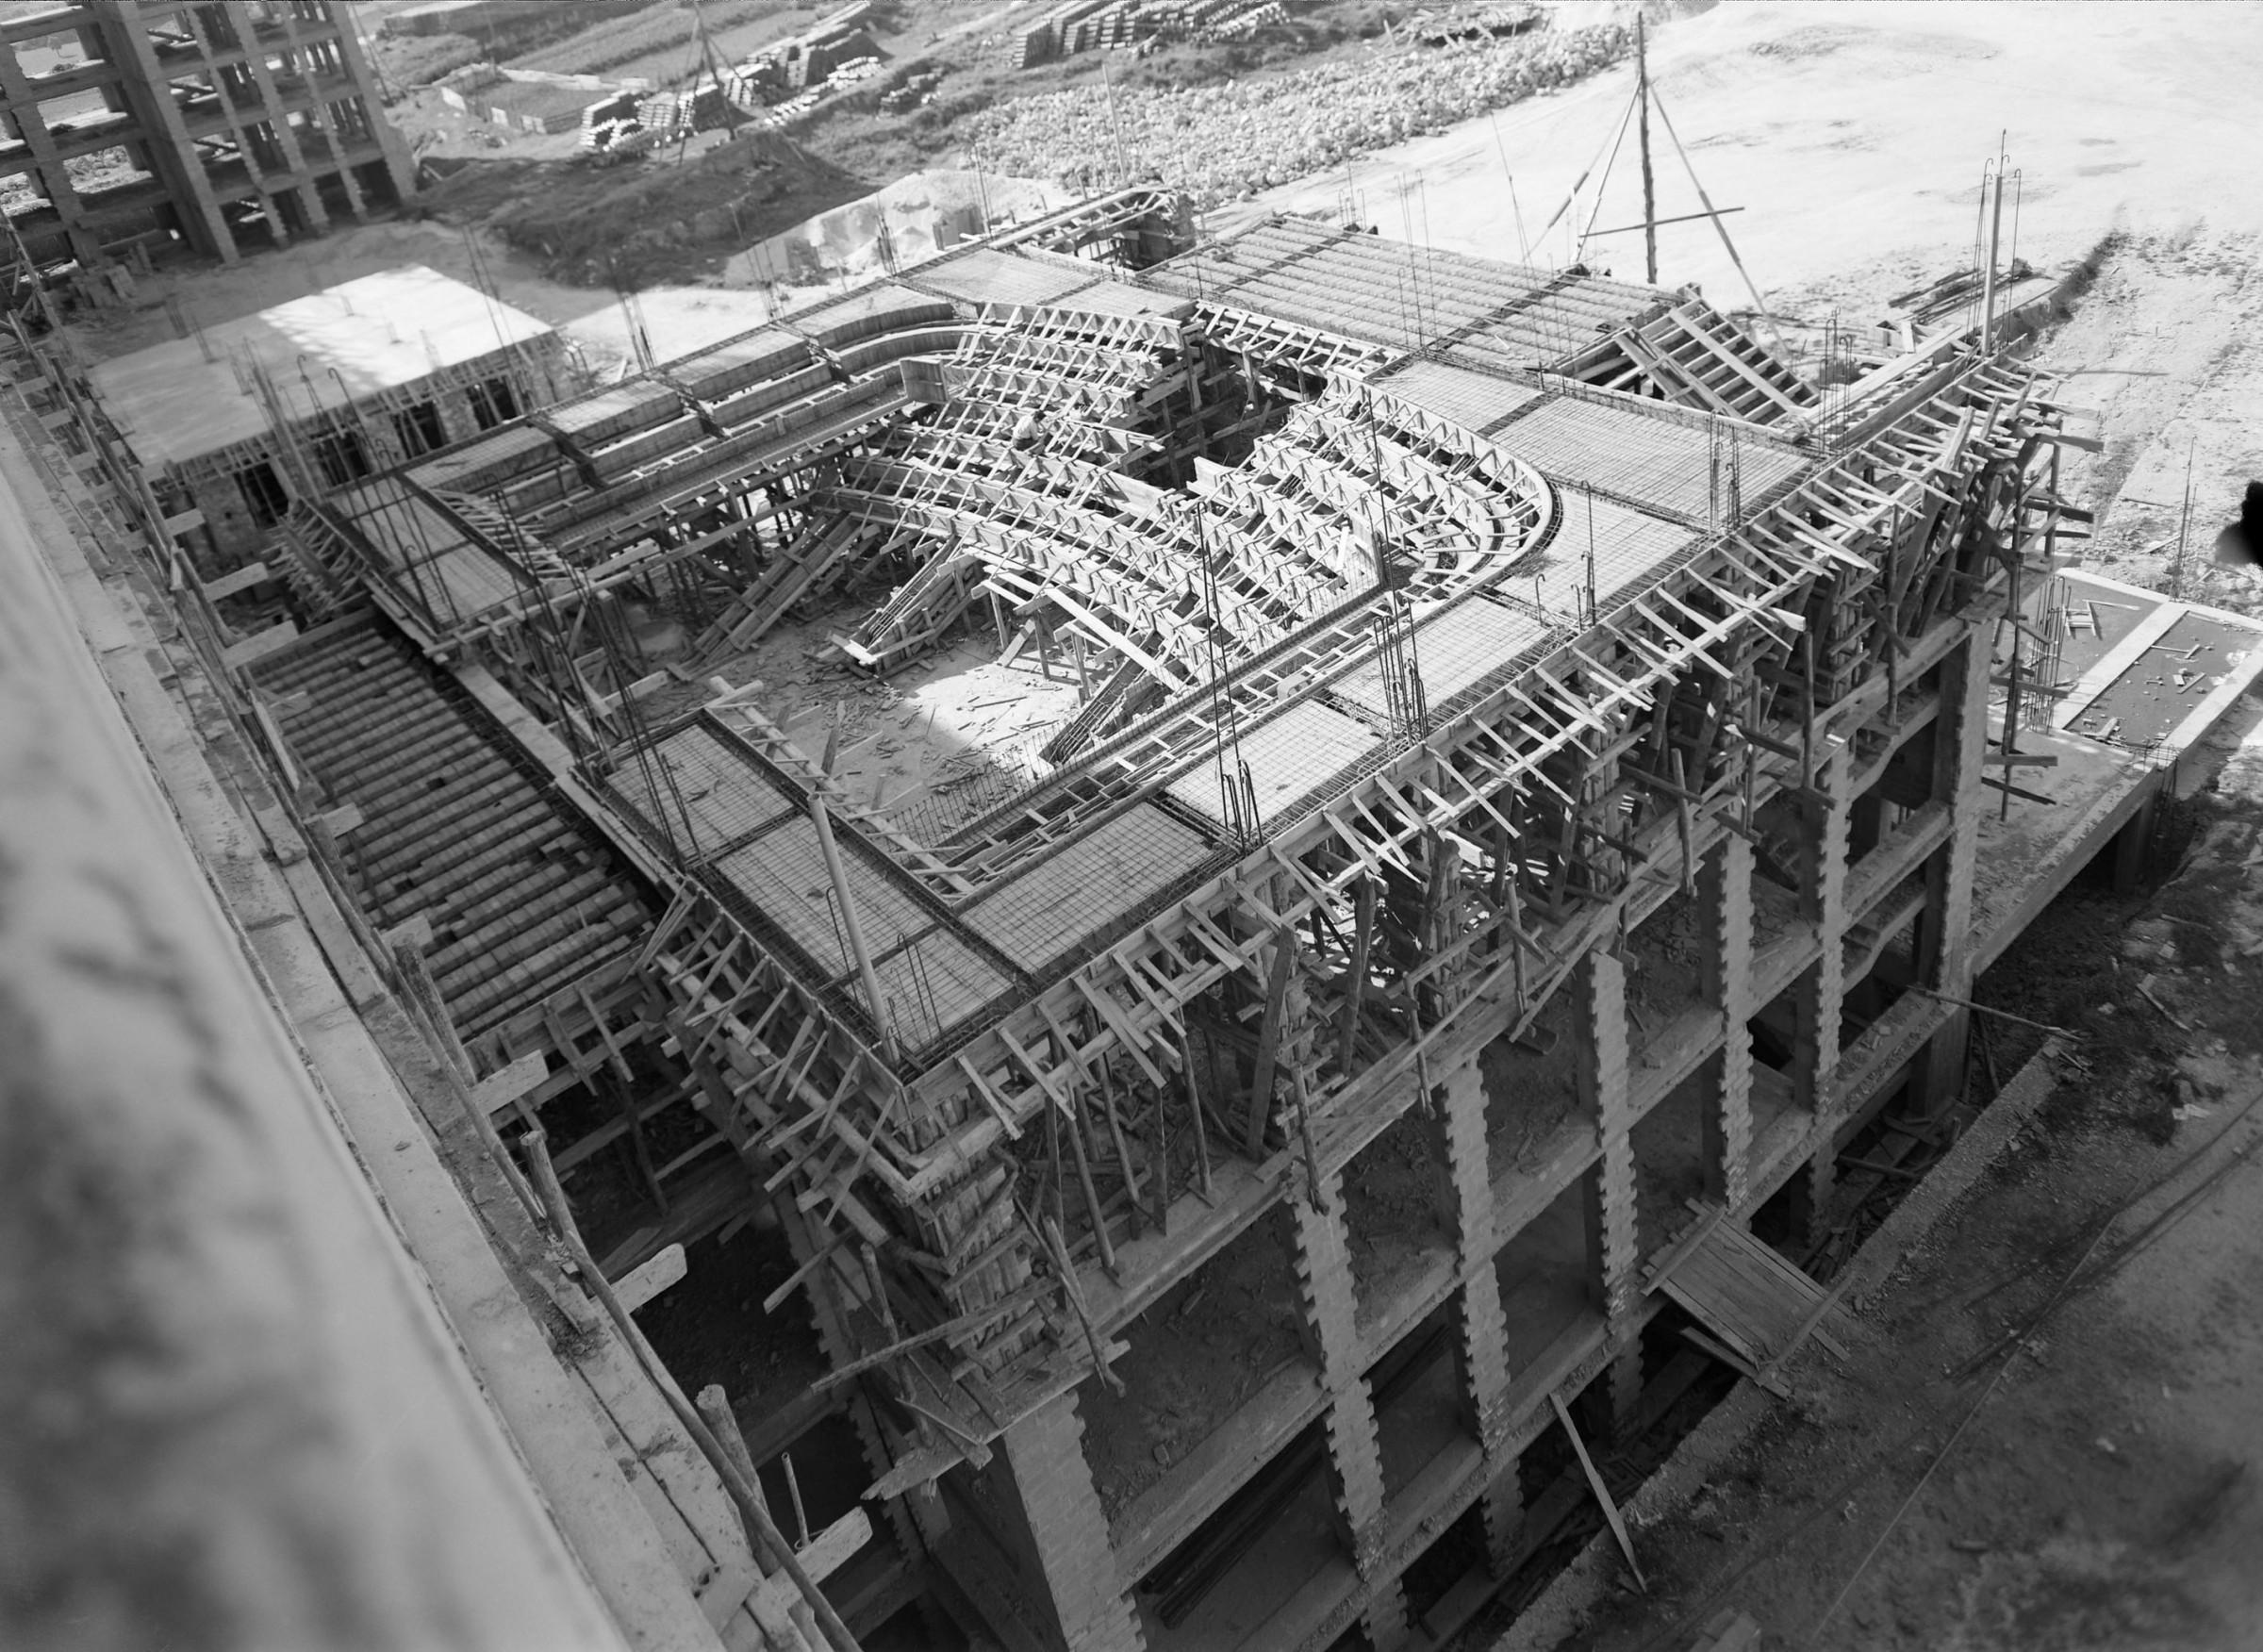 04-construc3a7c3a3o-hsm-aula-magna-1950.jpg